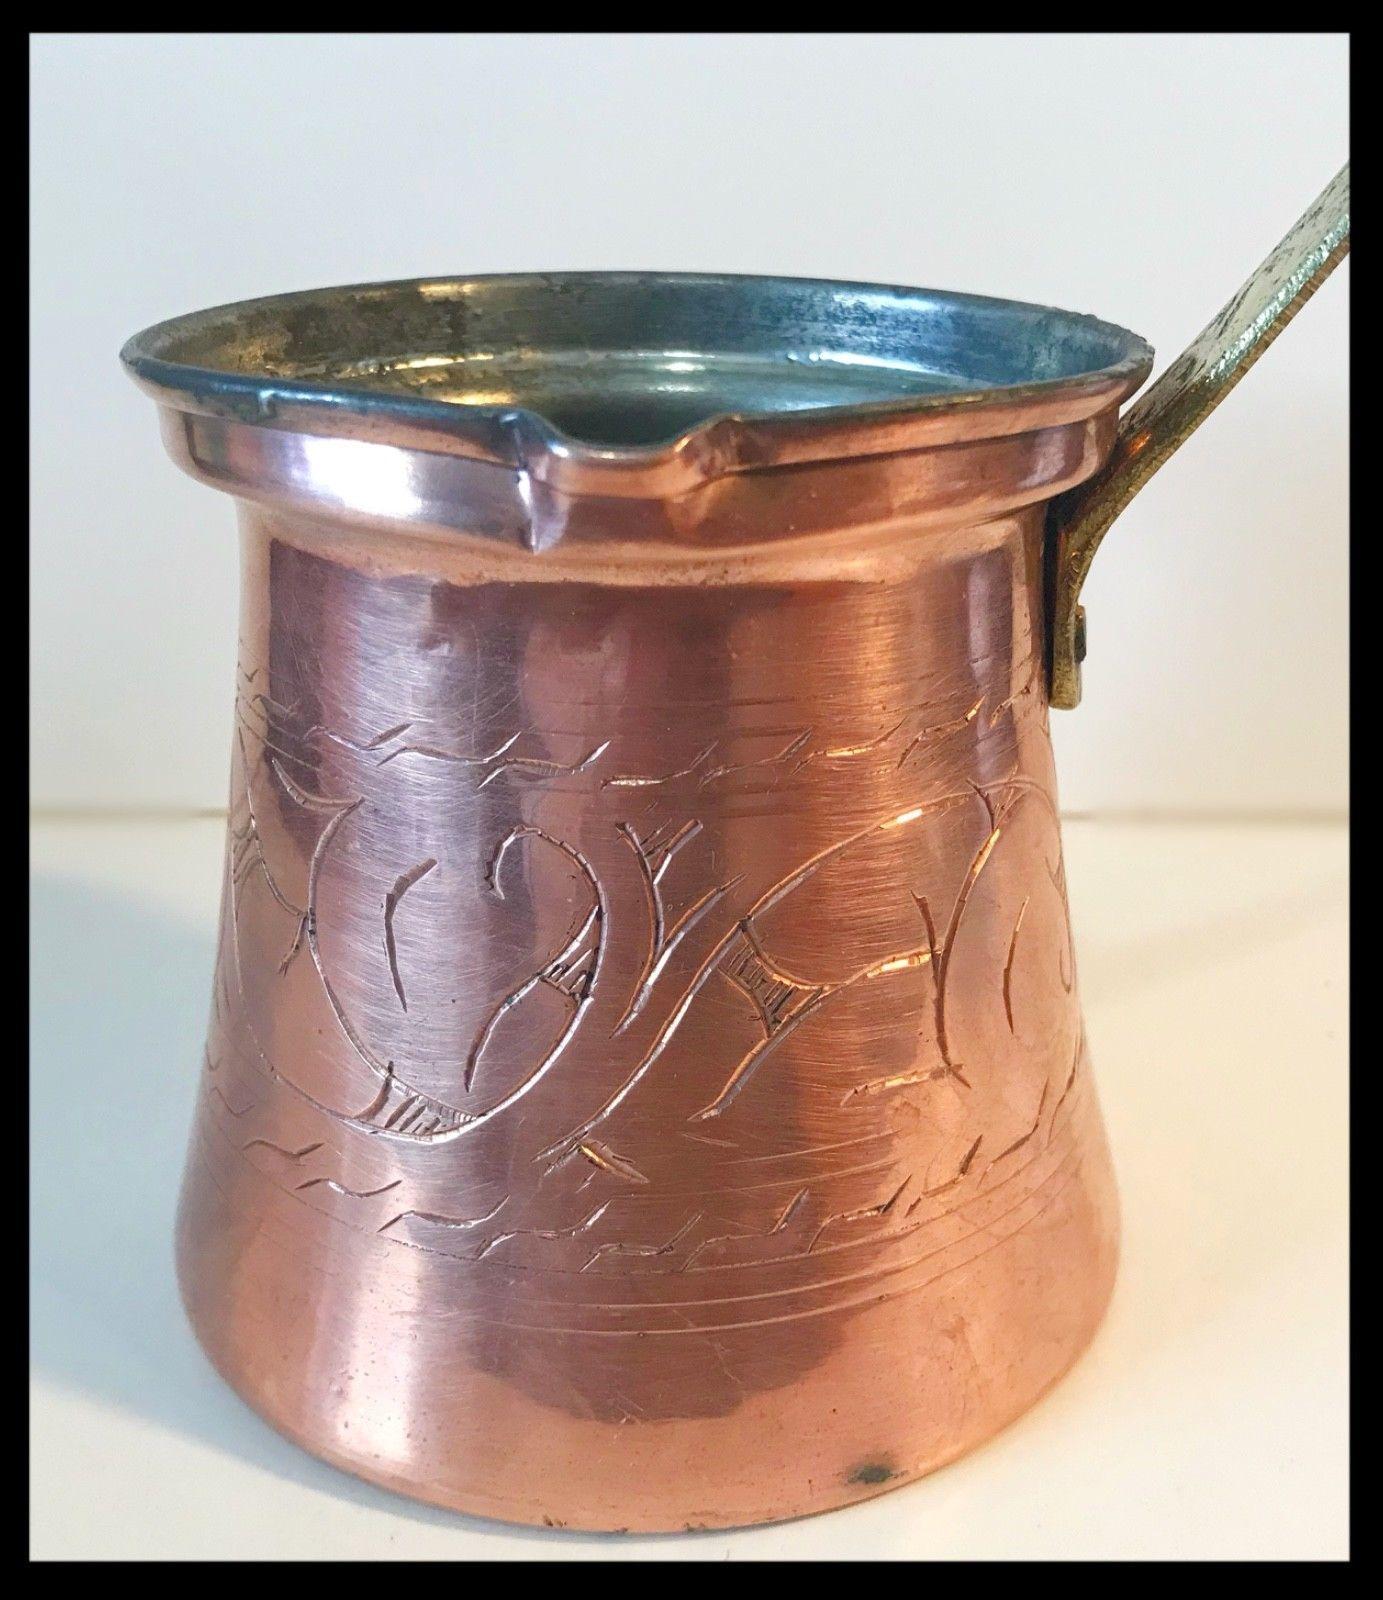 Vintage 1950's Turkish Copper Etched Coffee Pot